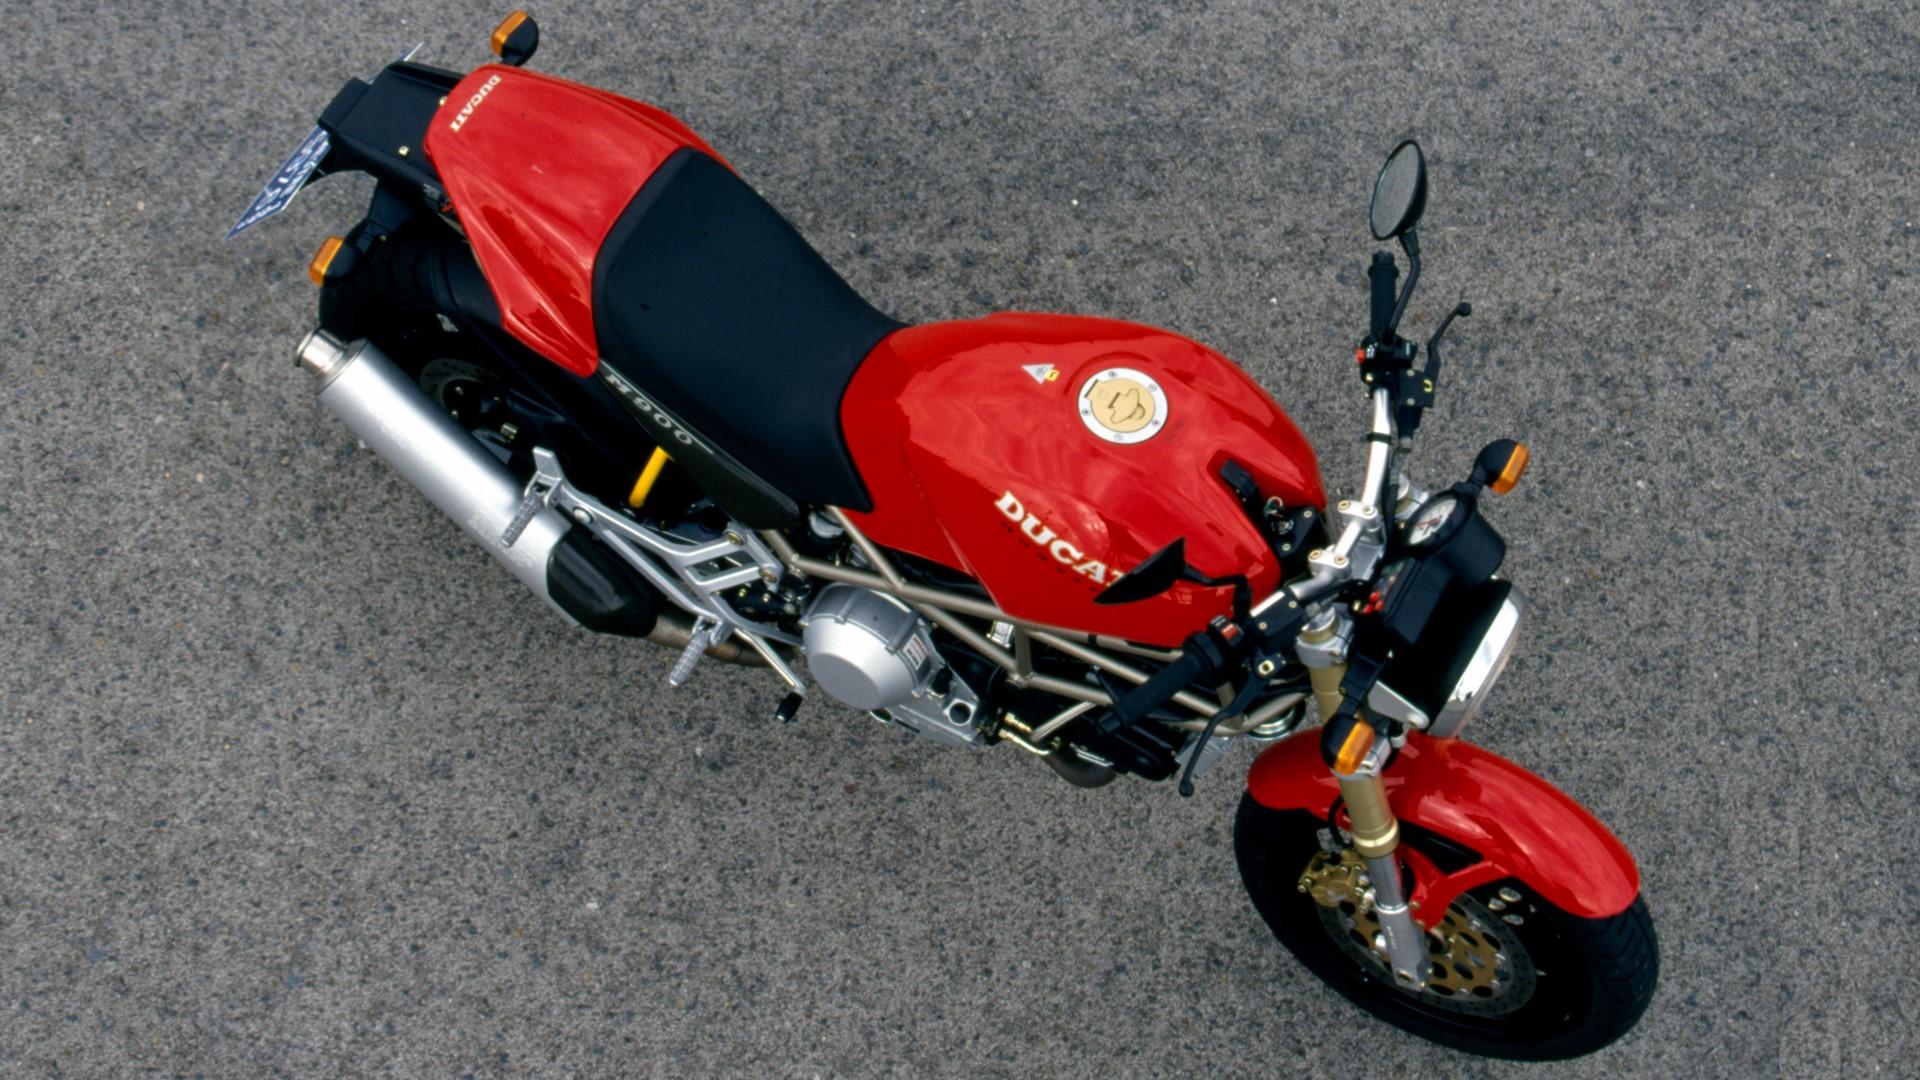 Retroprueba Ducati Monster 900 de 1993 fotos